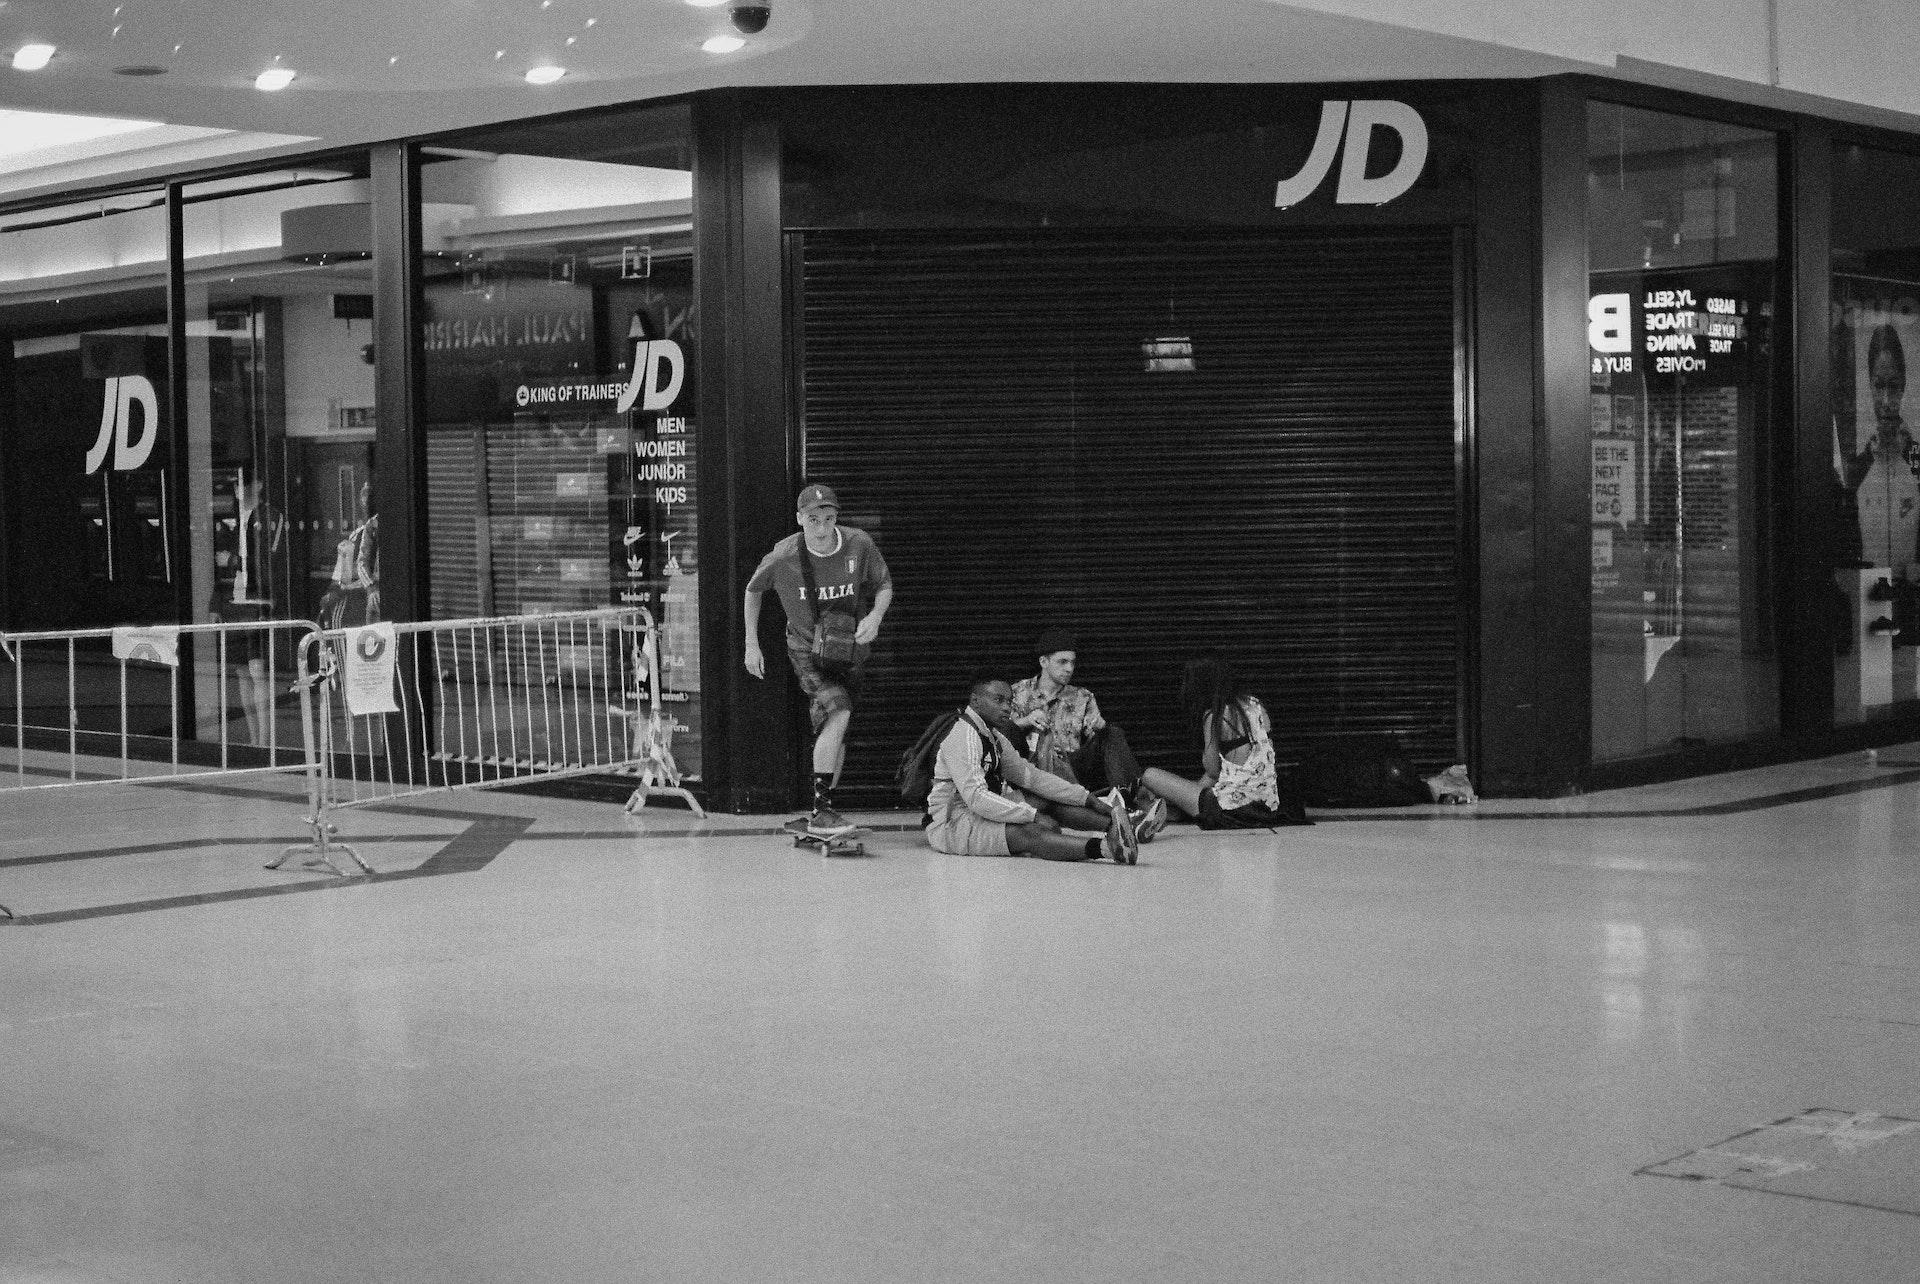 Stratford_Centre_Skaters_Lighter-40